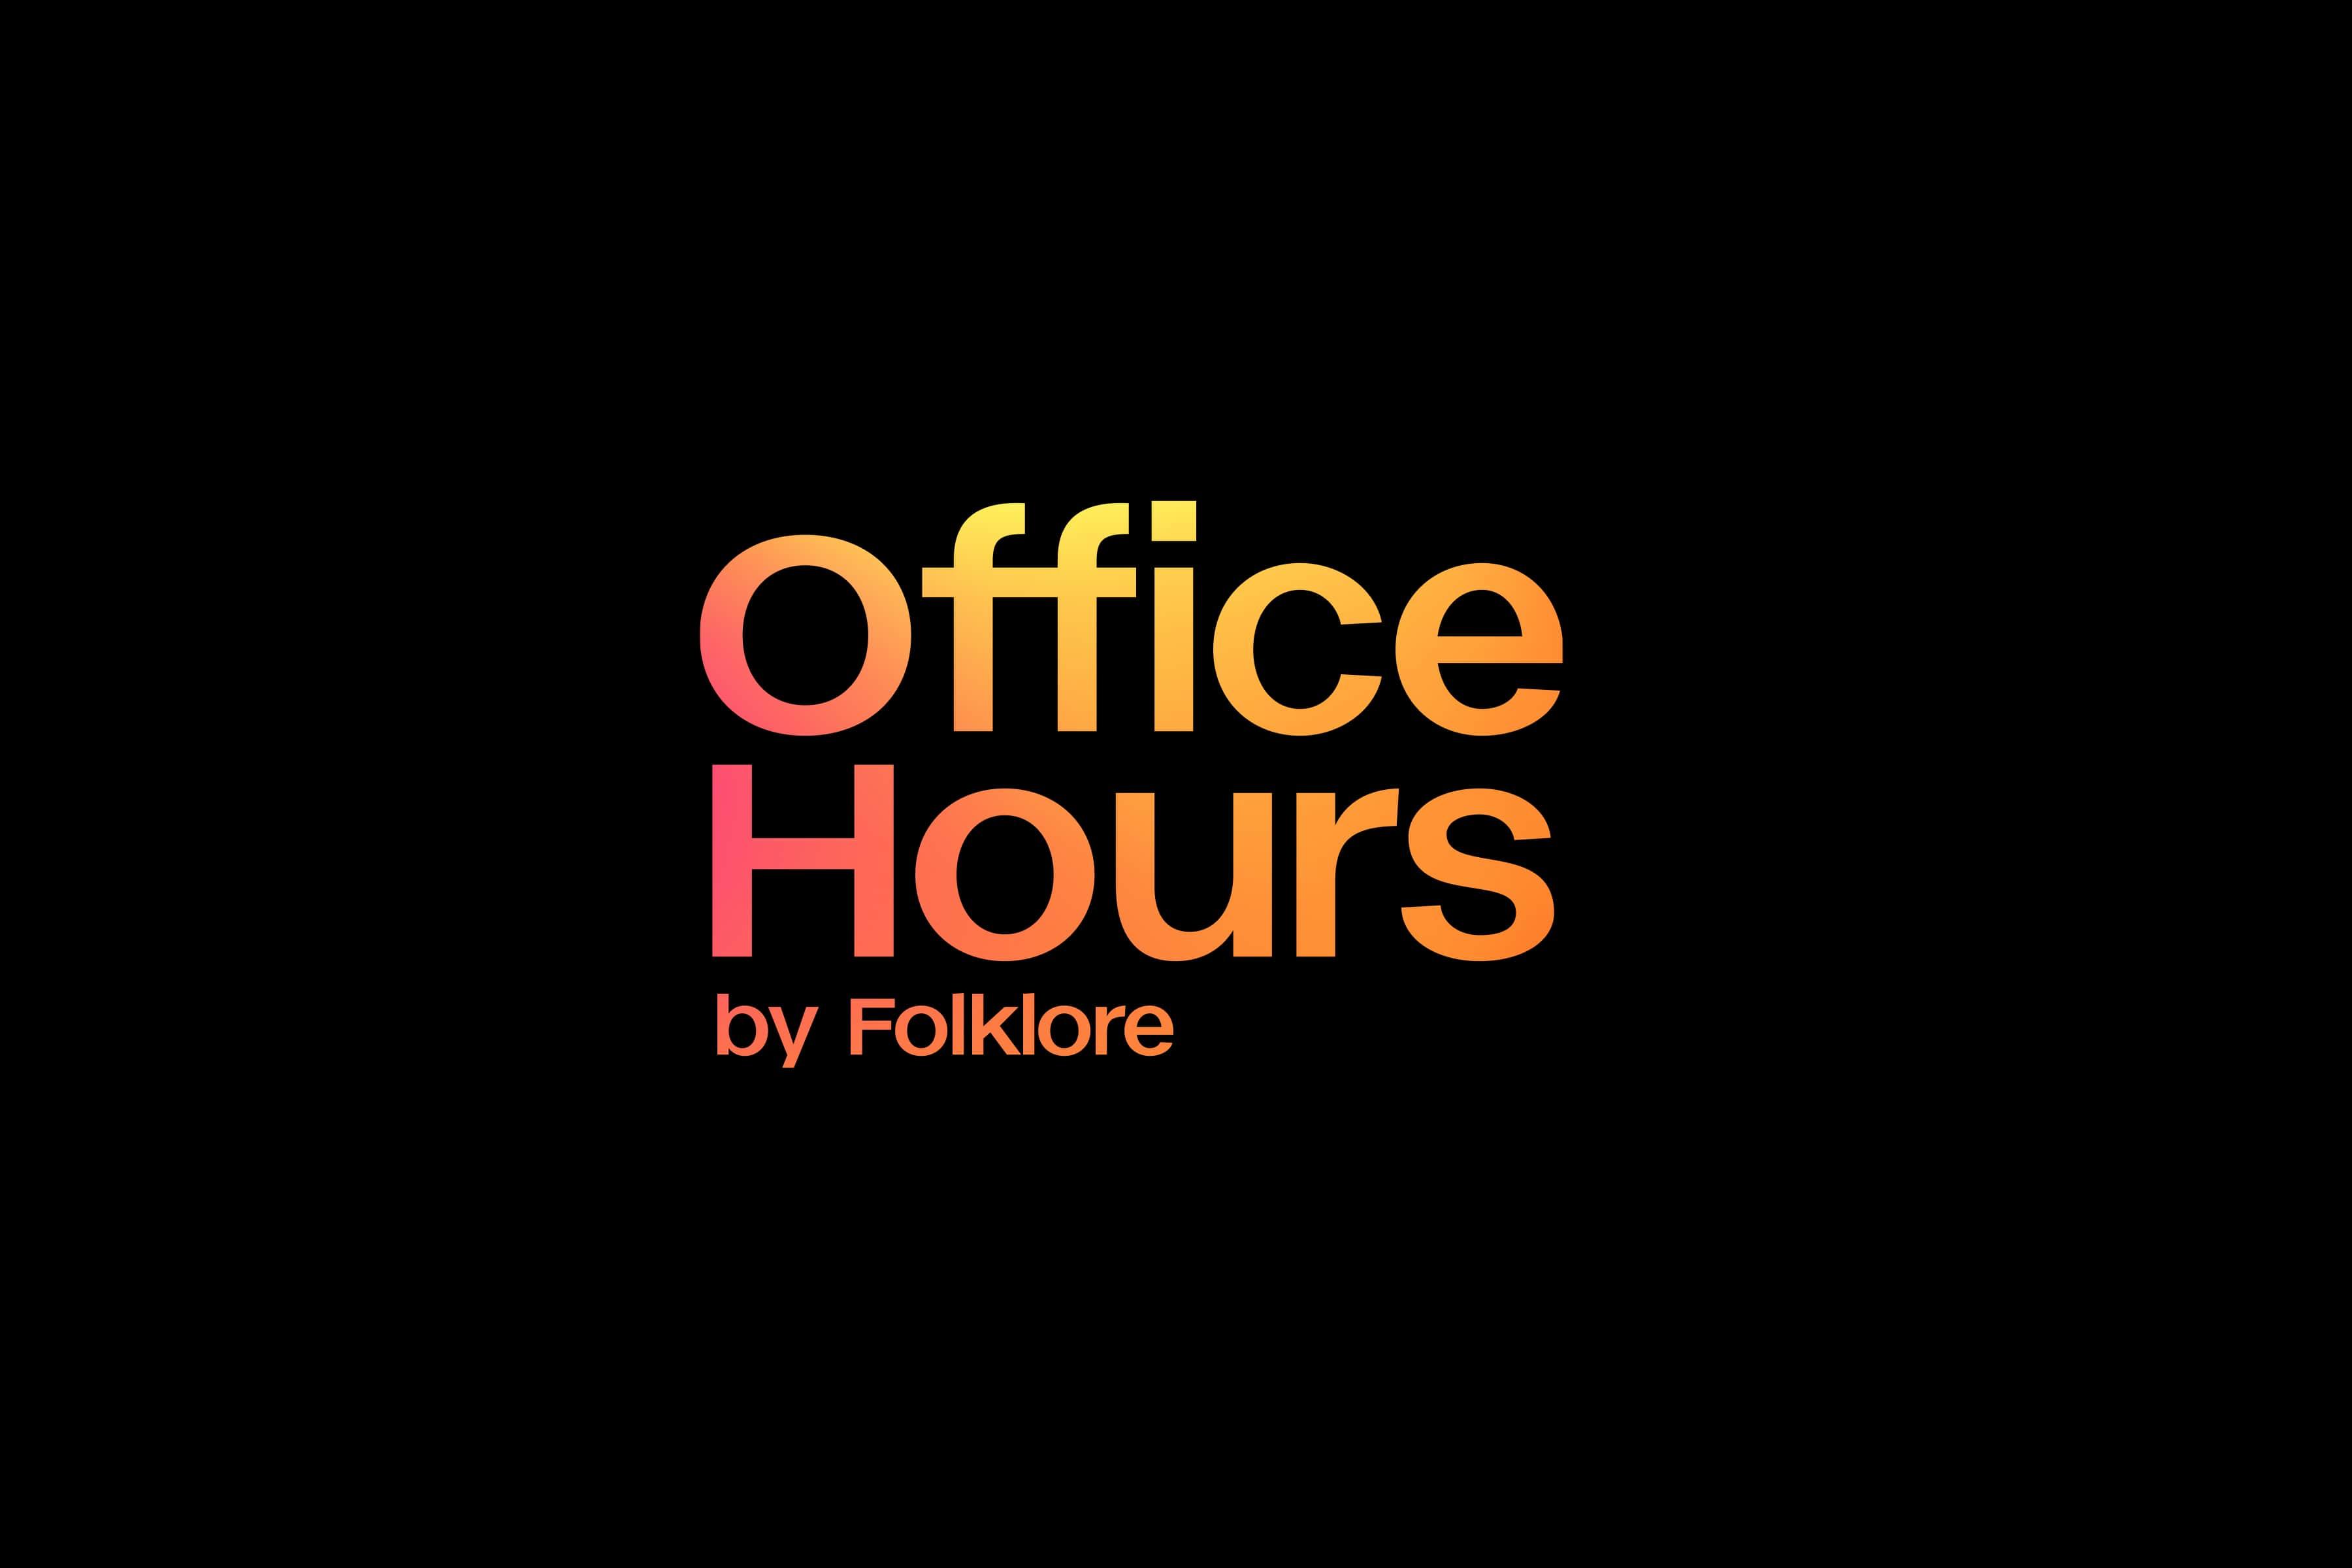 Office Hours Hero Image